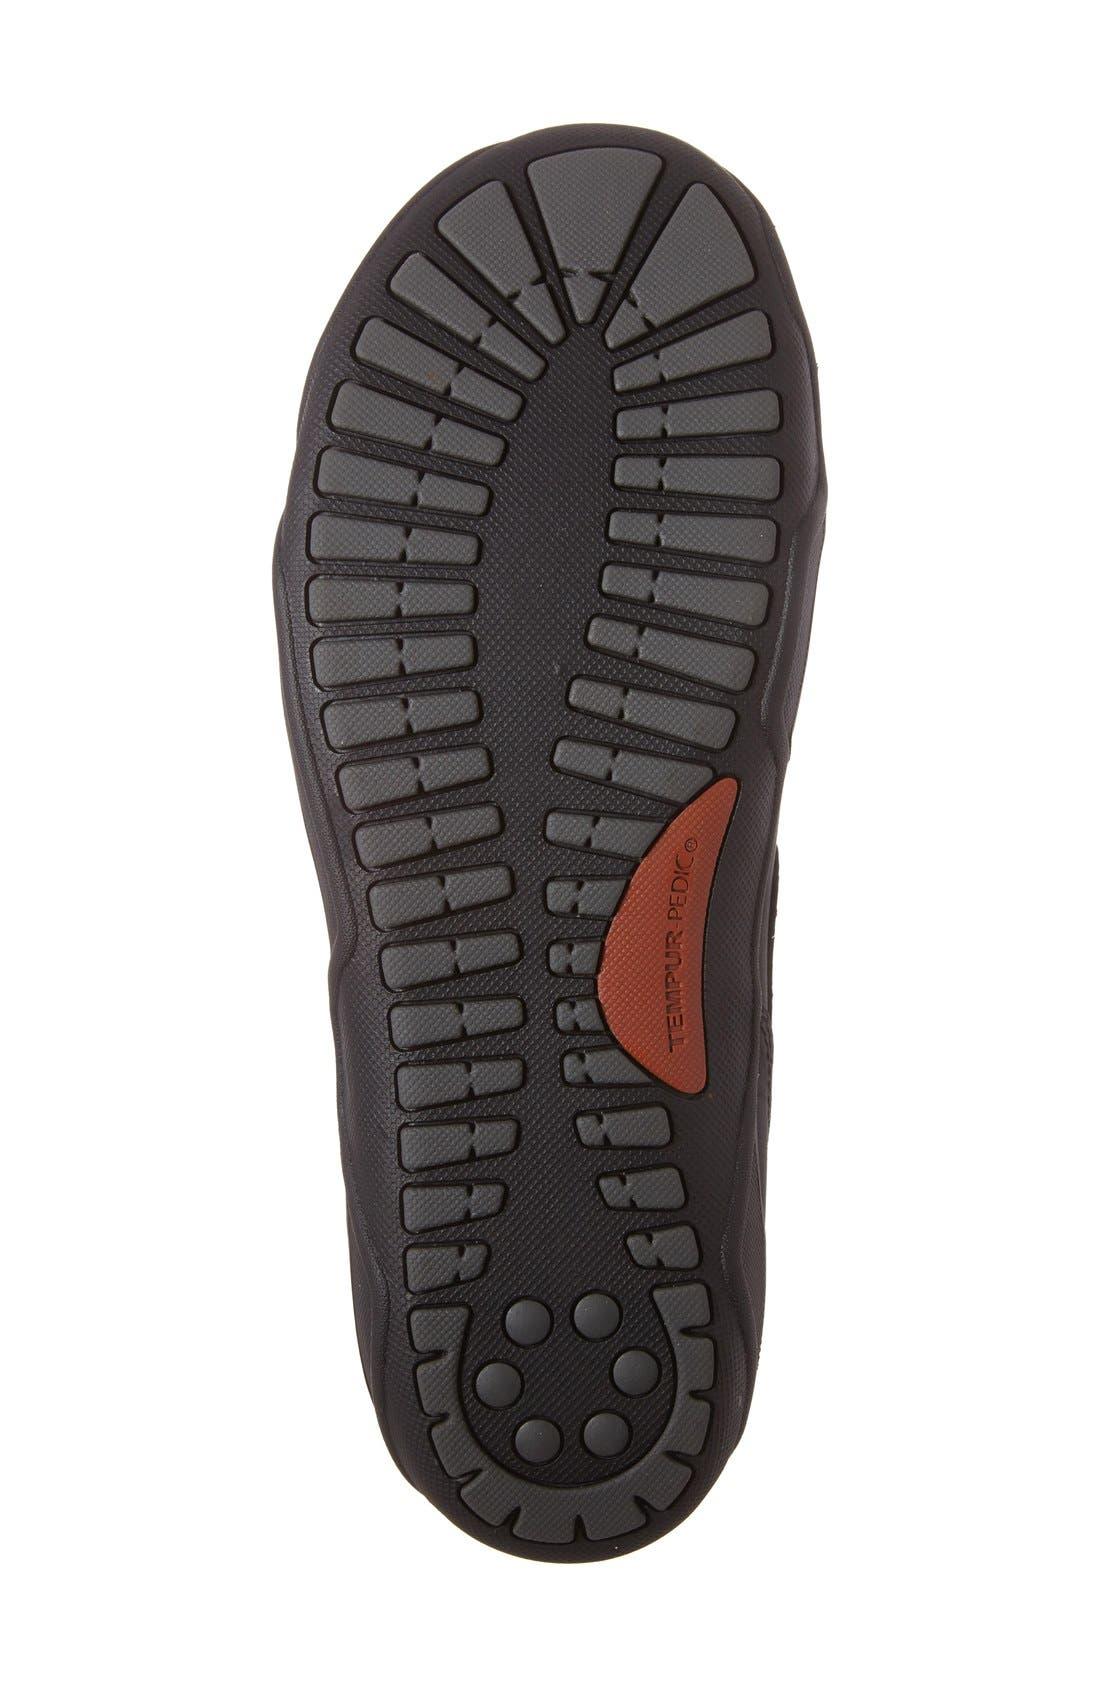 Markis Moc Toe Slip-On,                             Alternate thumbnail 4, color,                             Black Leather